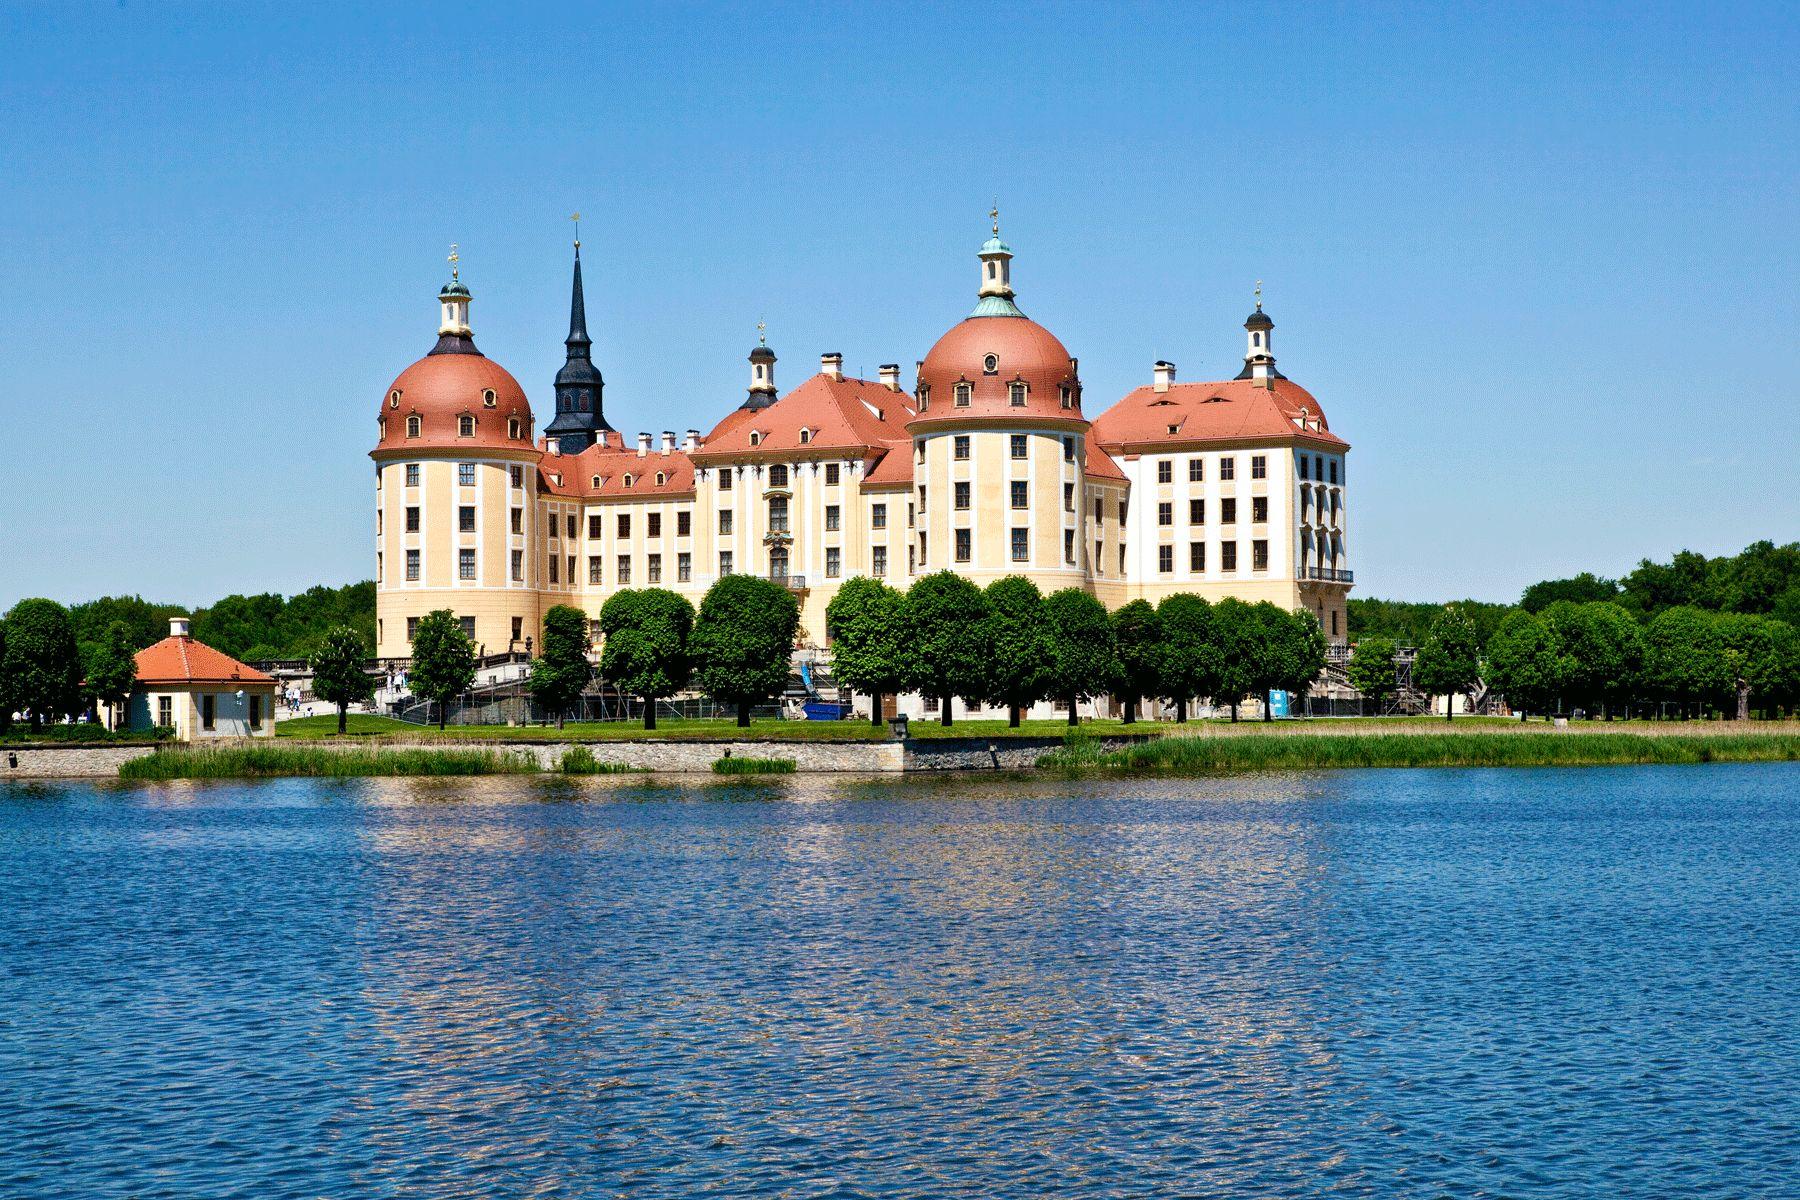 Schloss Moritzburg iStock 471720235 web